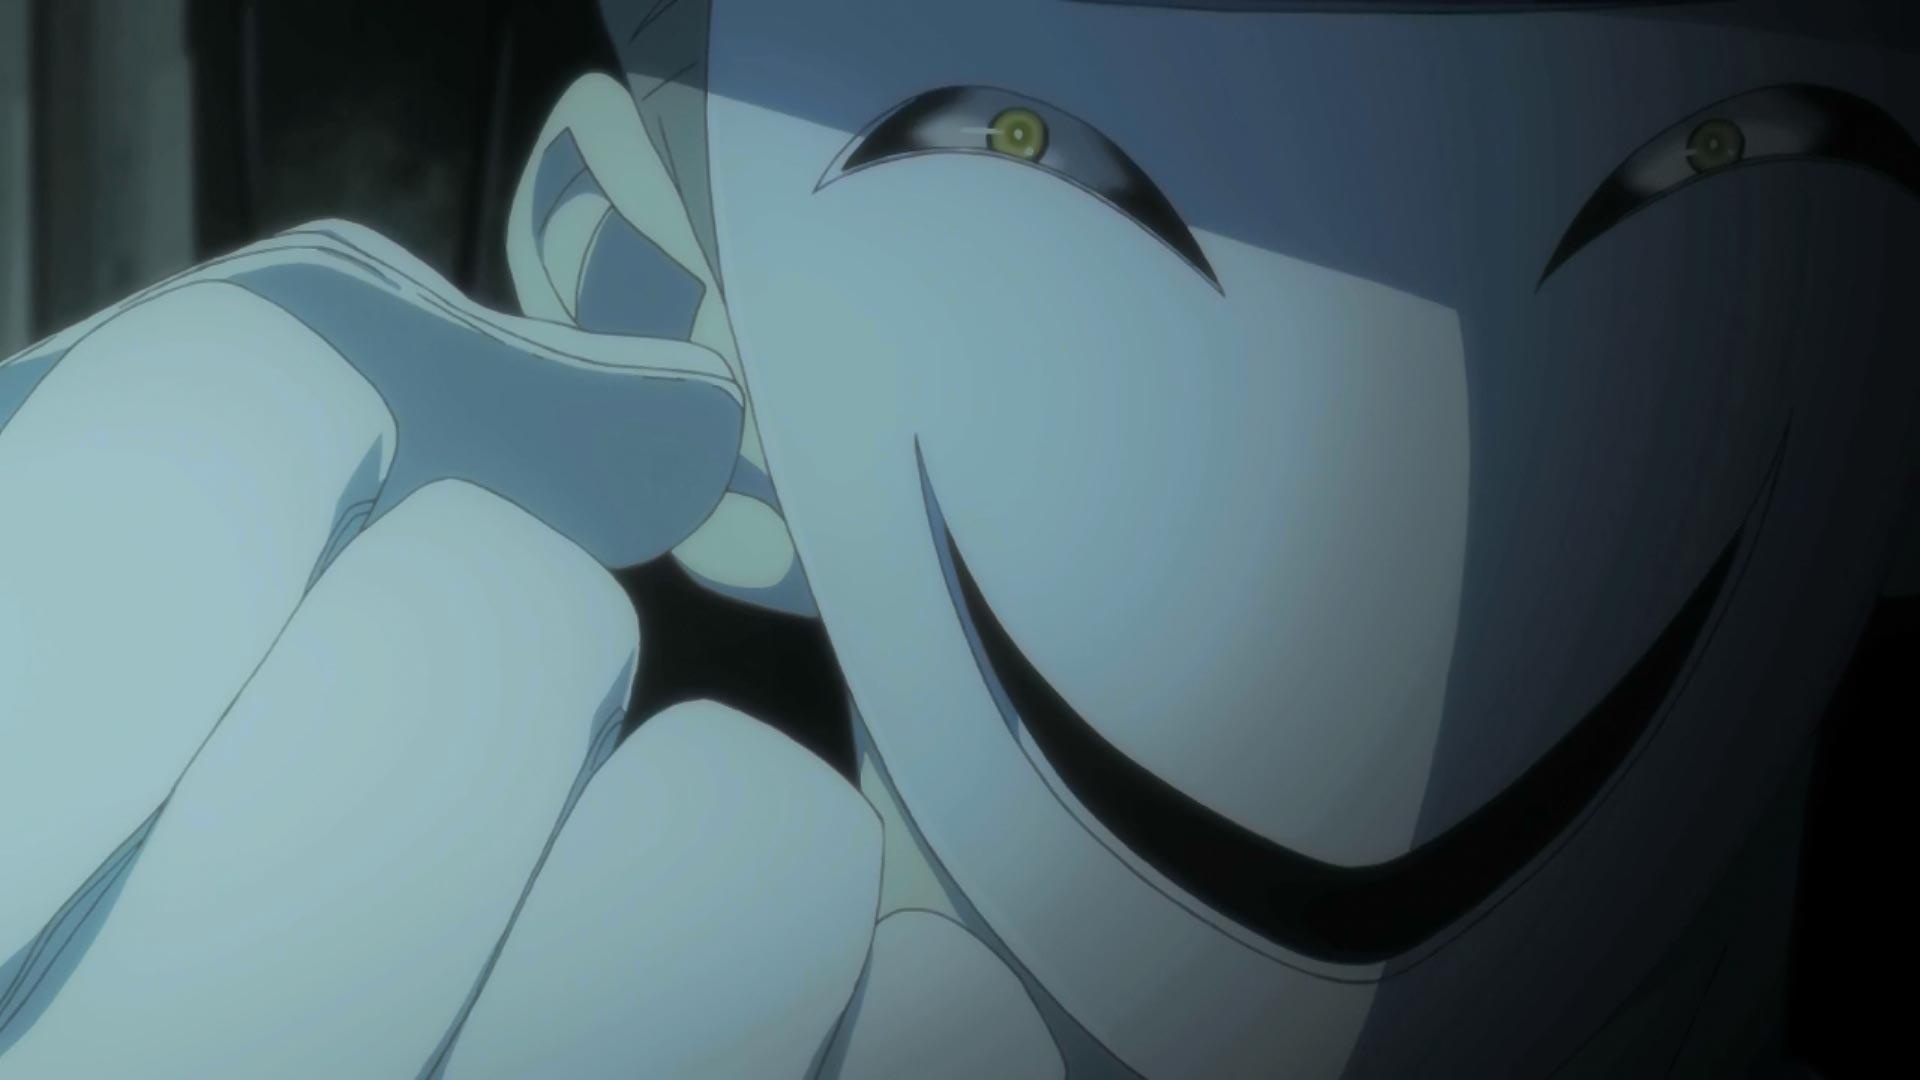 Anime Jester Mask Materi Pelajaran 9